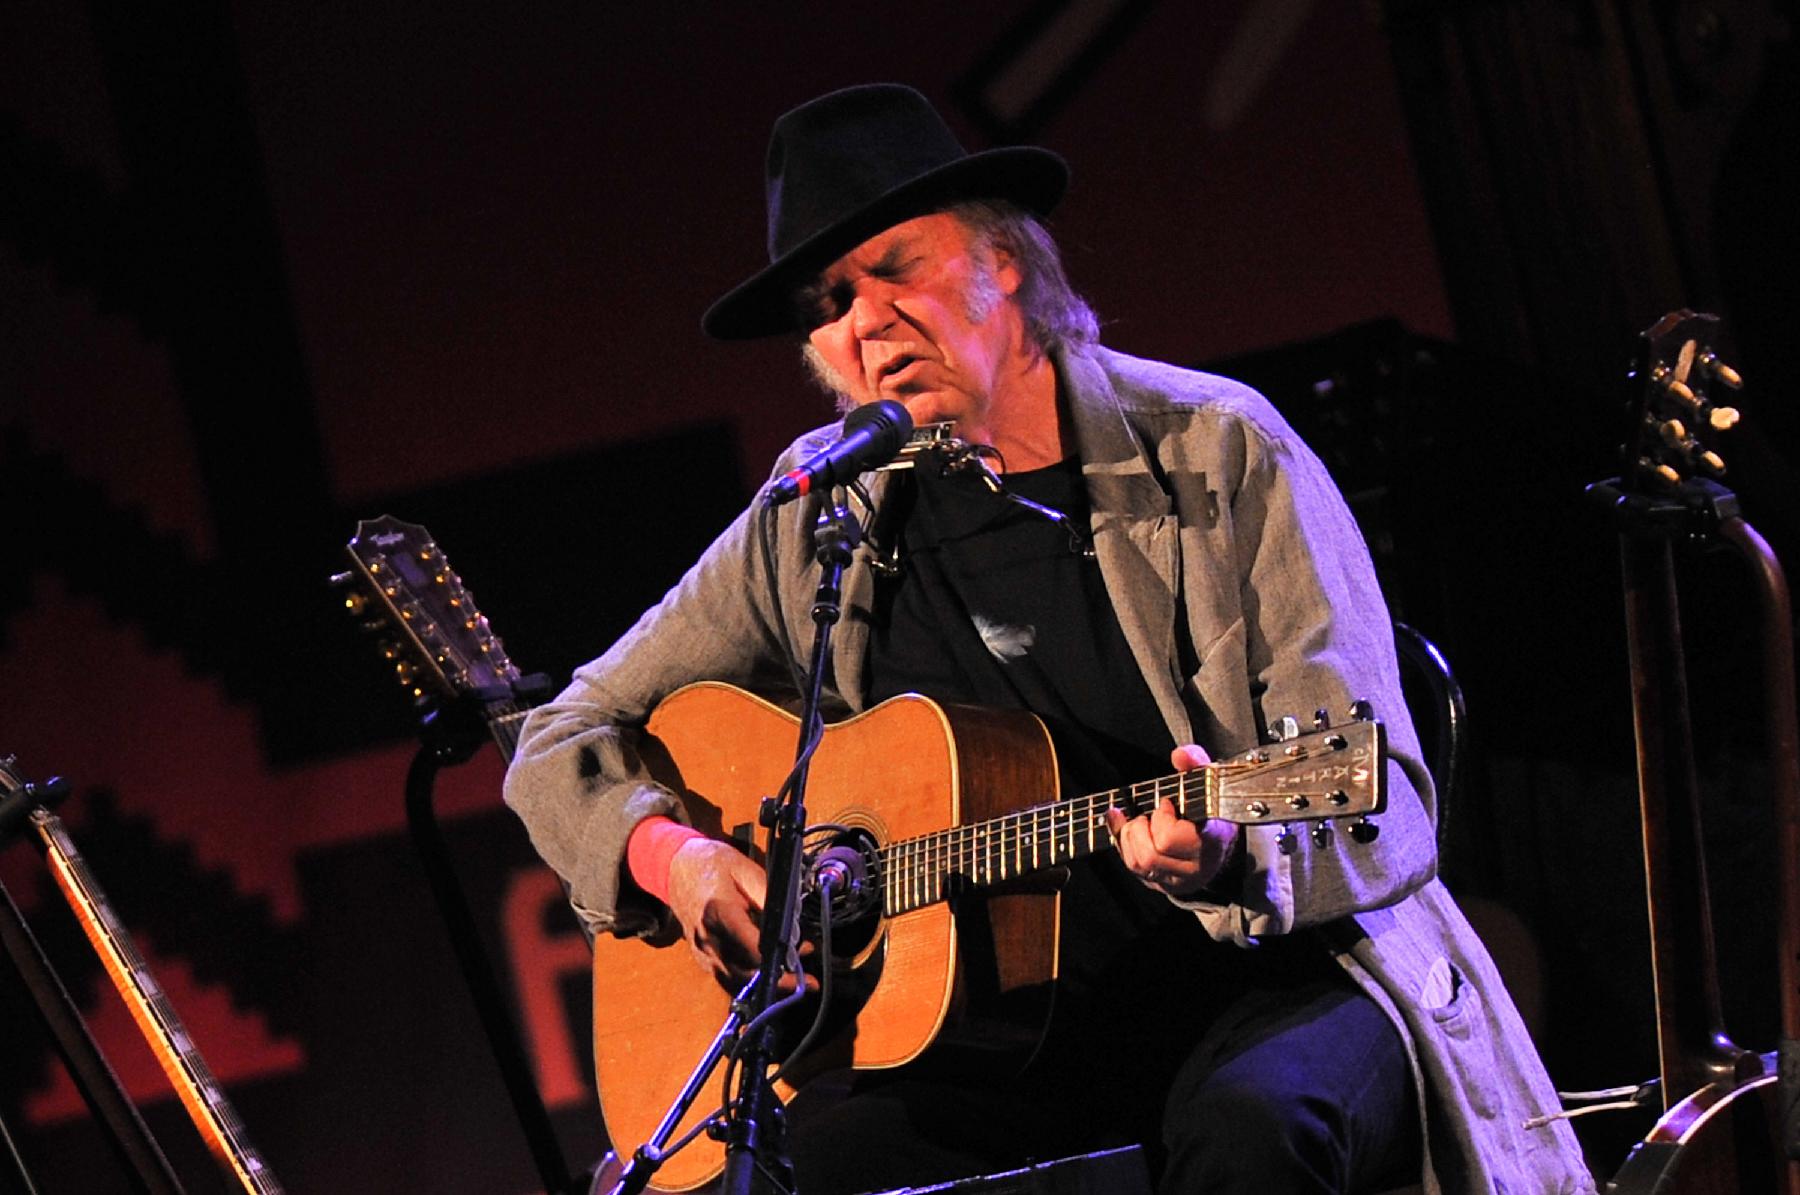 Neil Young's Pono Kickstarter Raises Over $6 Million